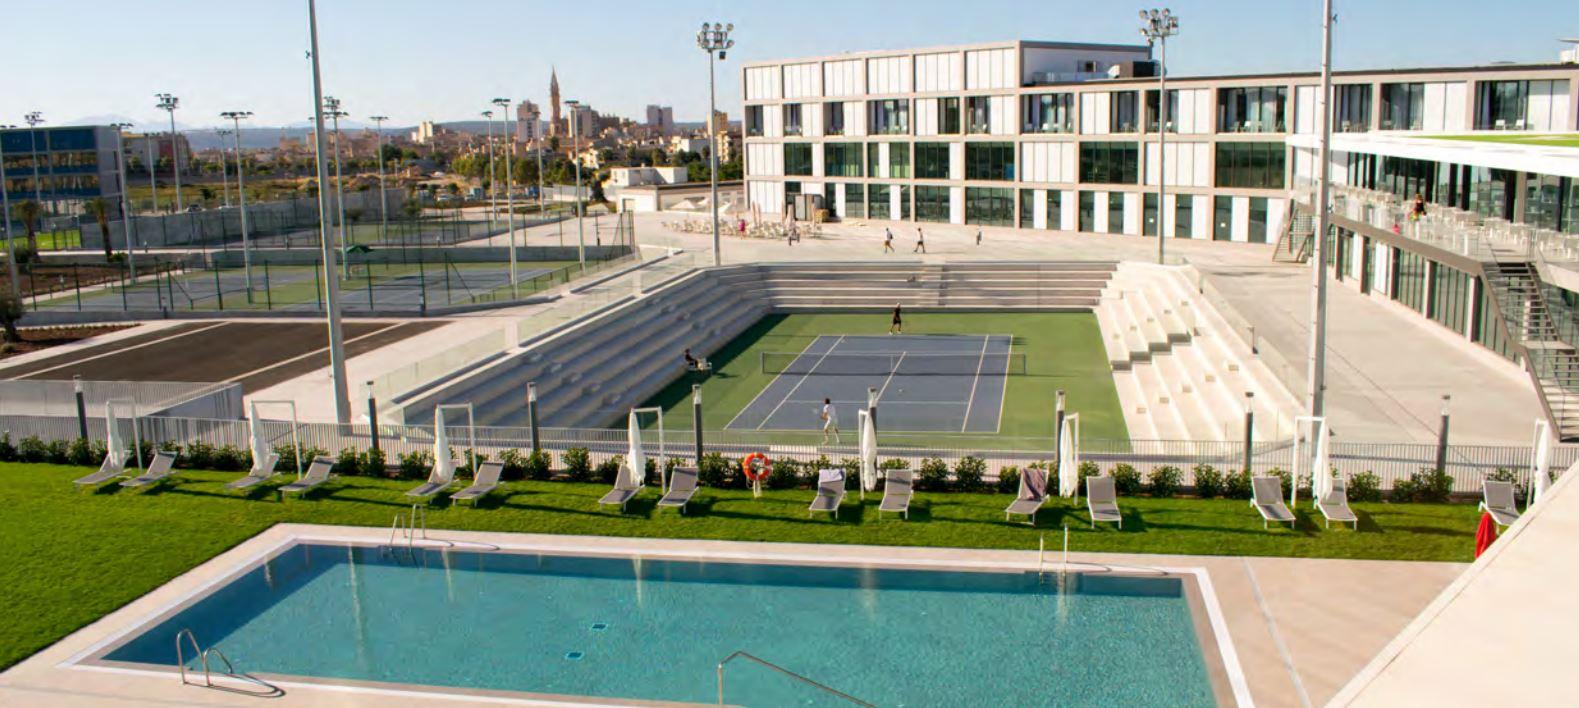 Rafa Nadal Academy Facility.JPG